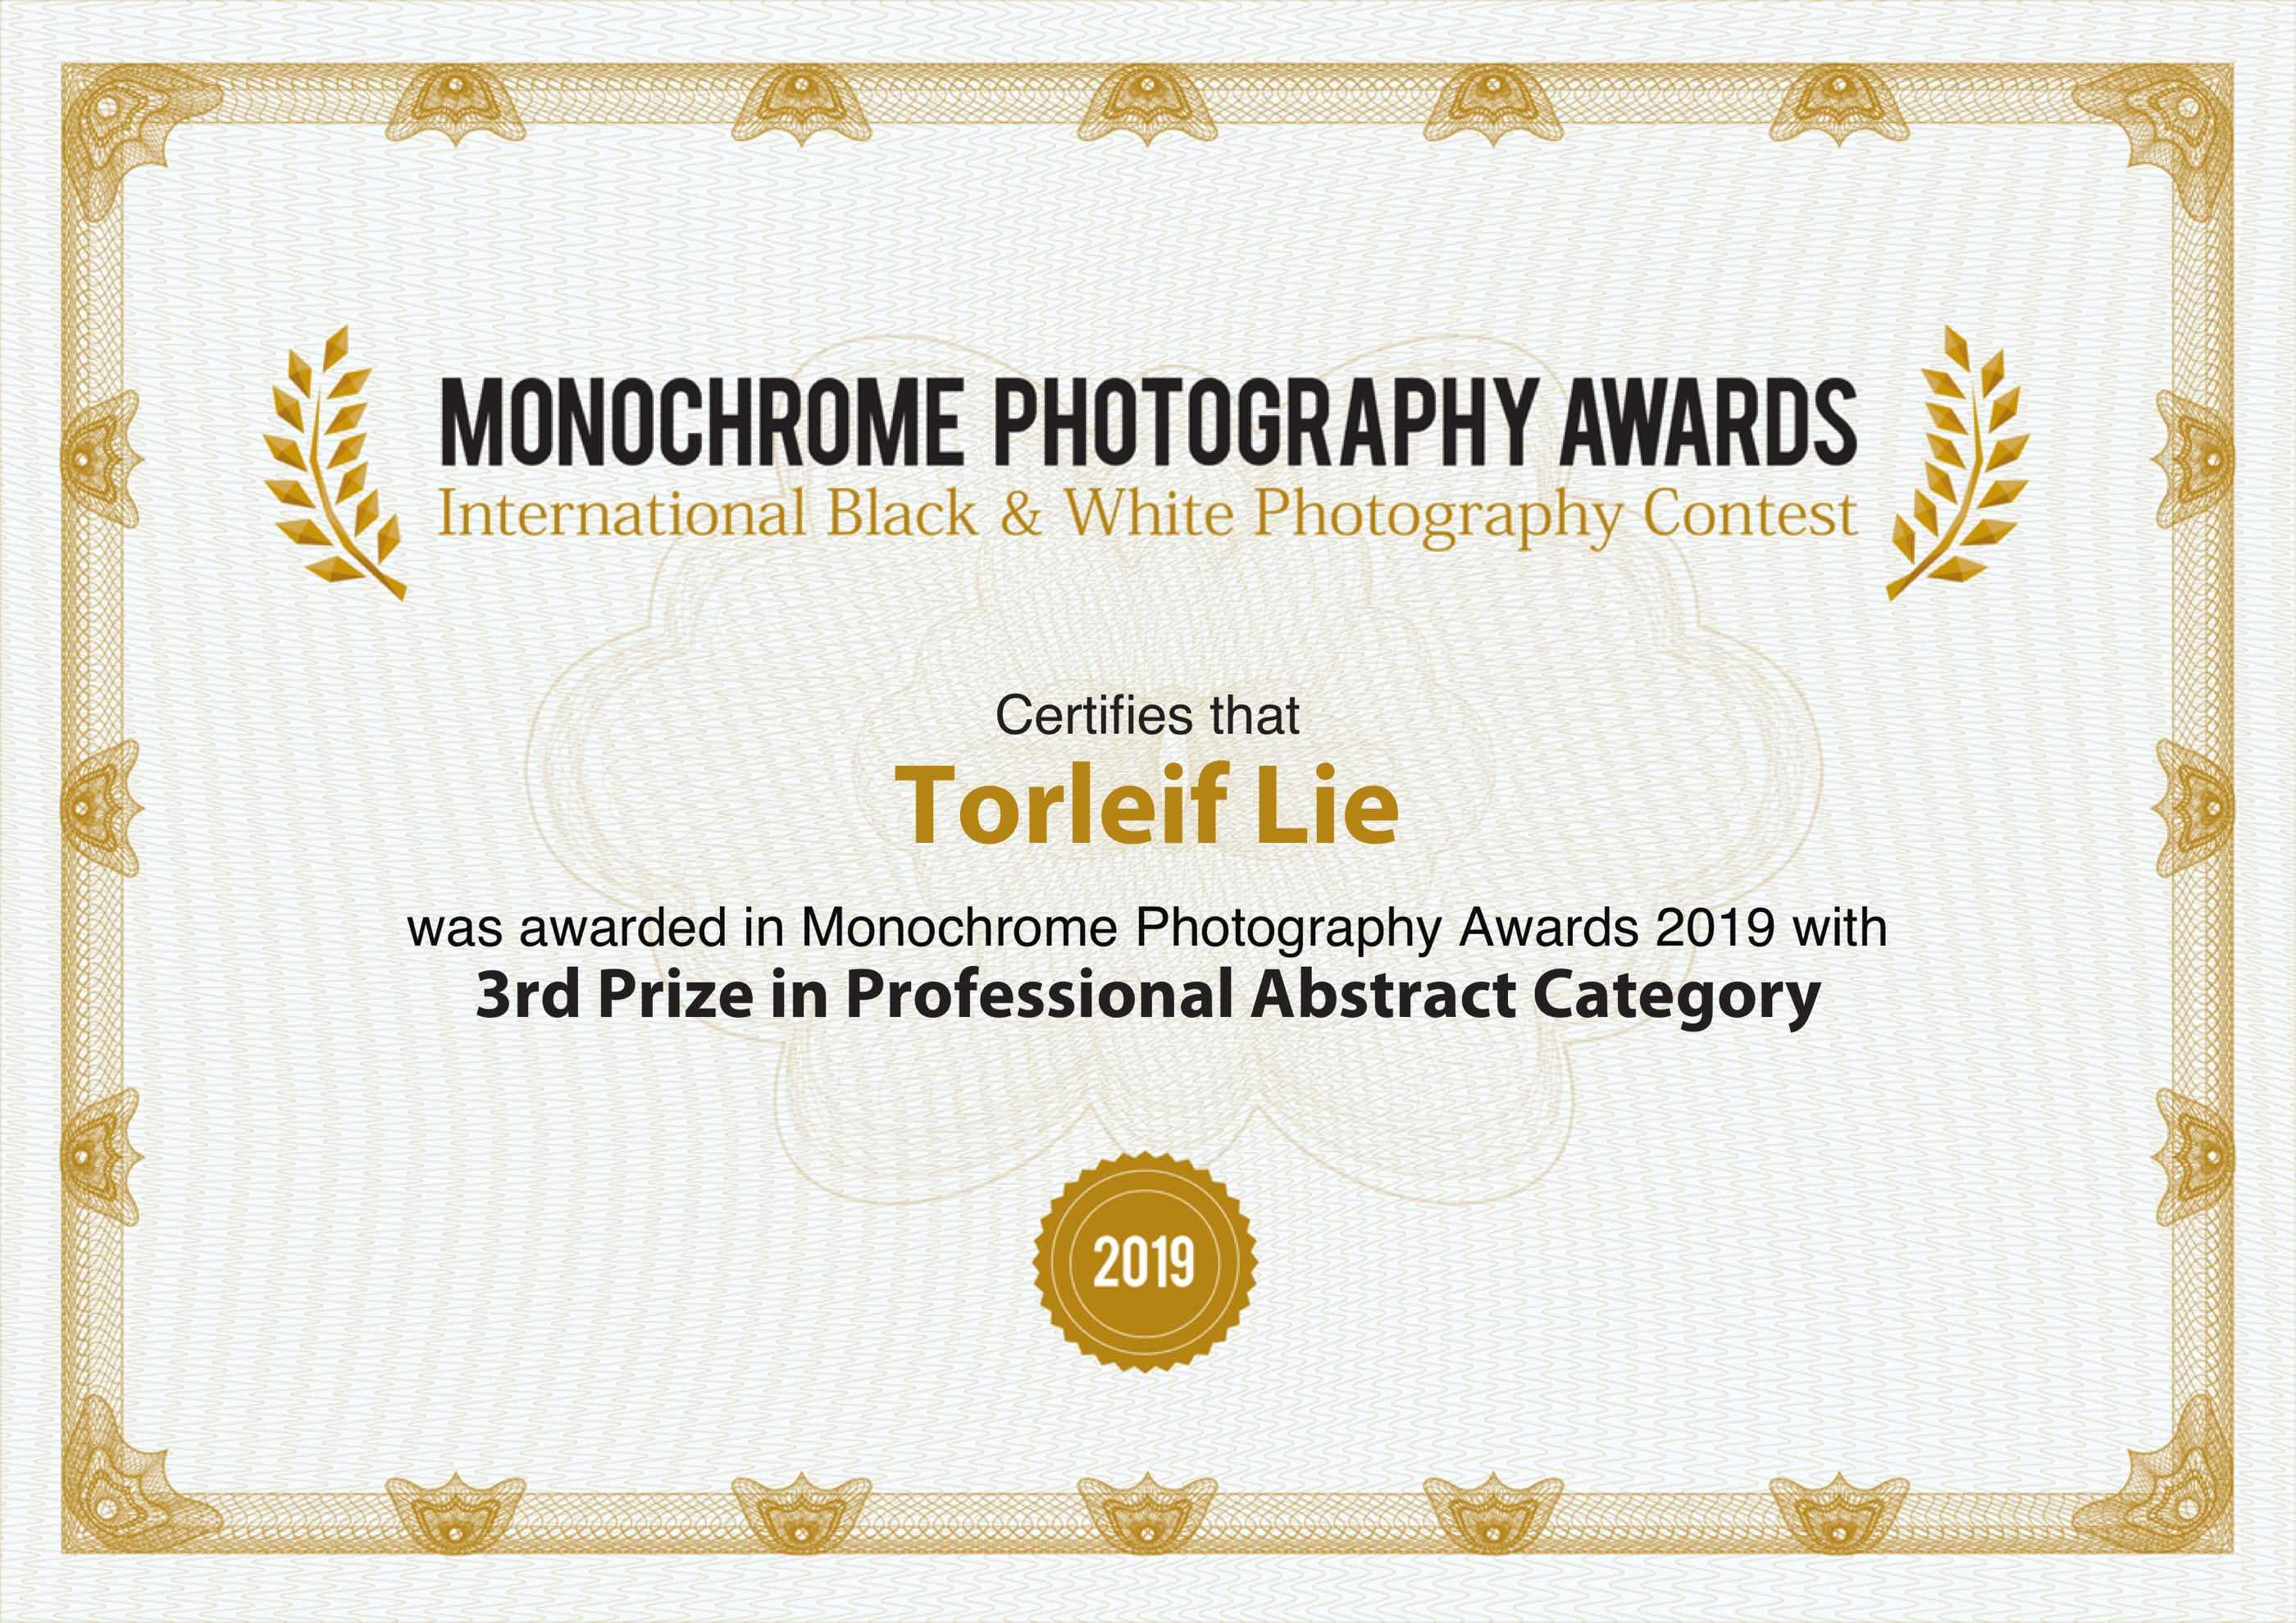 monoawards_certifcate_Torleif_Lie Kerauso